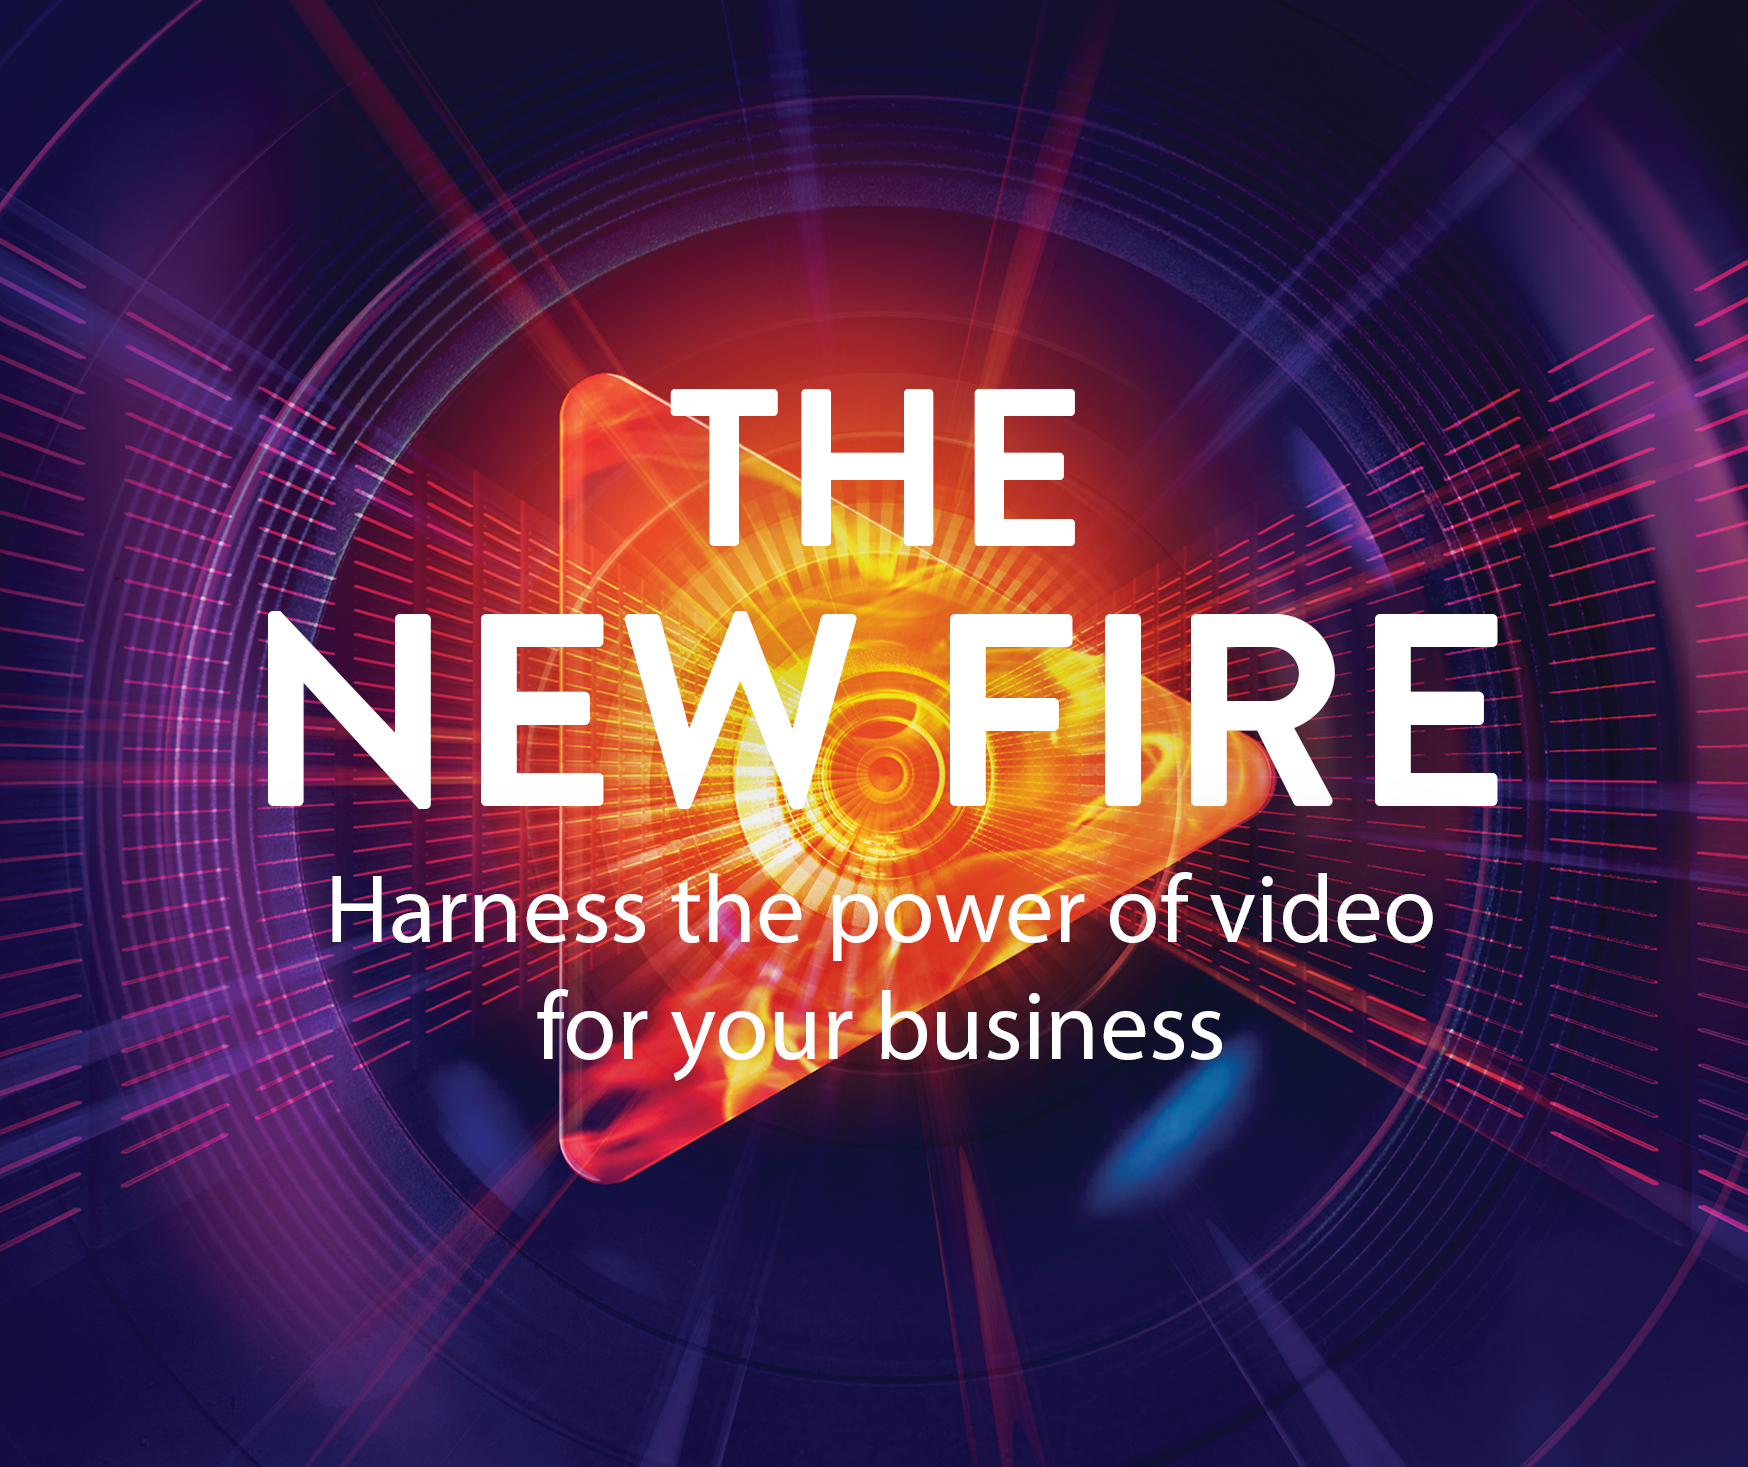 New Fire Masthead